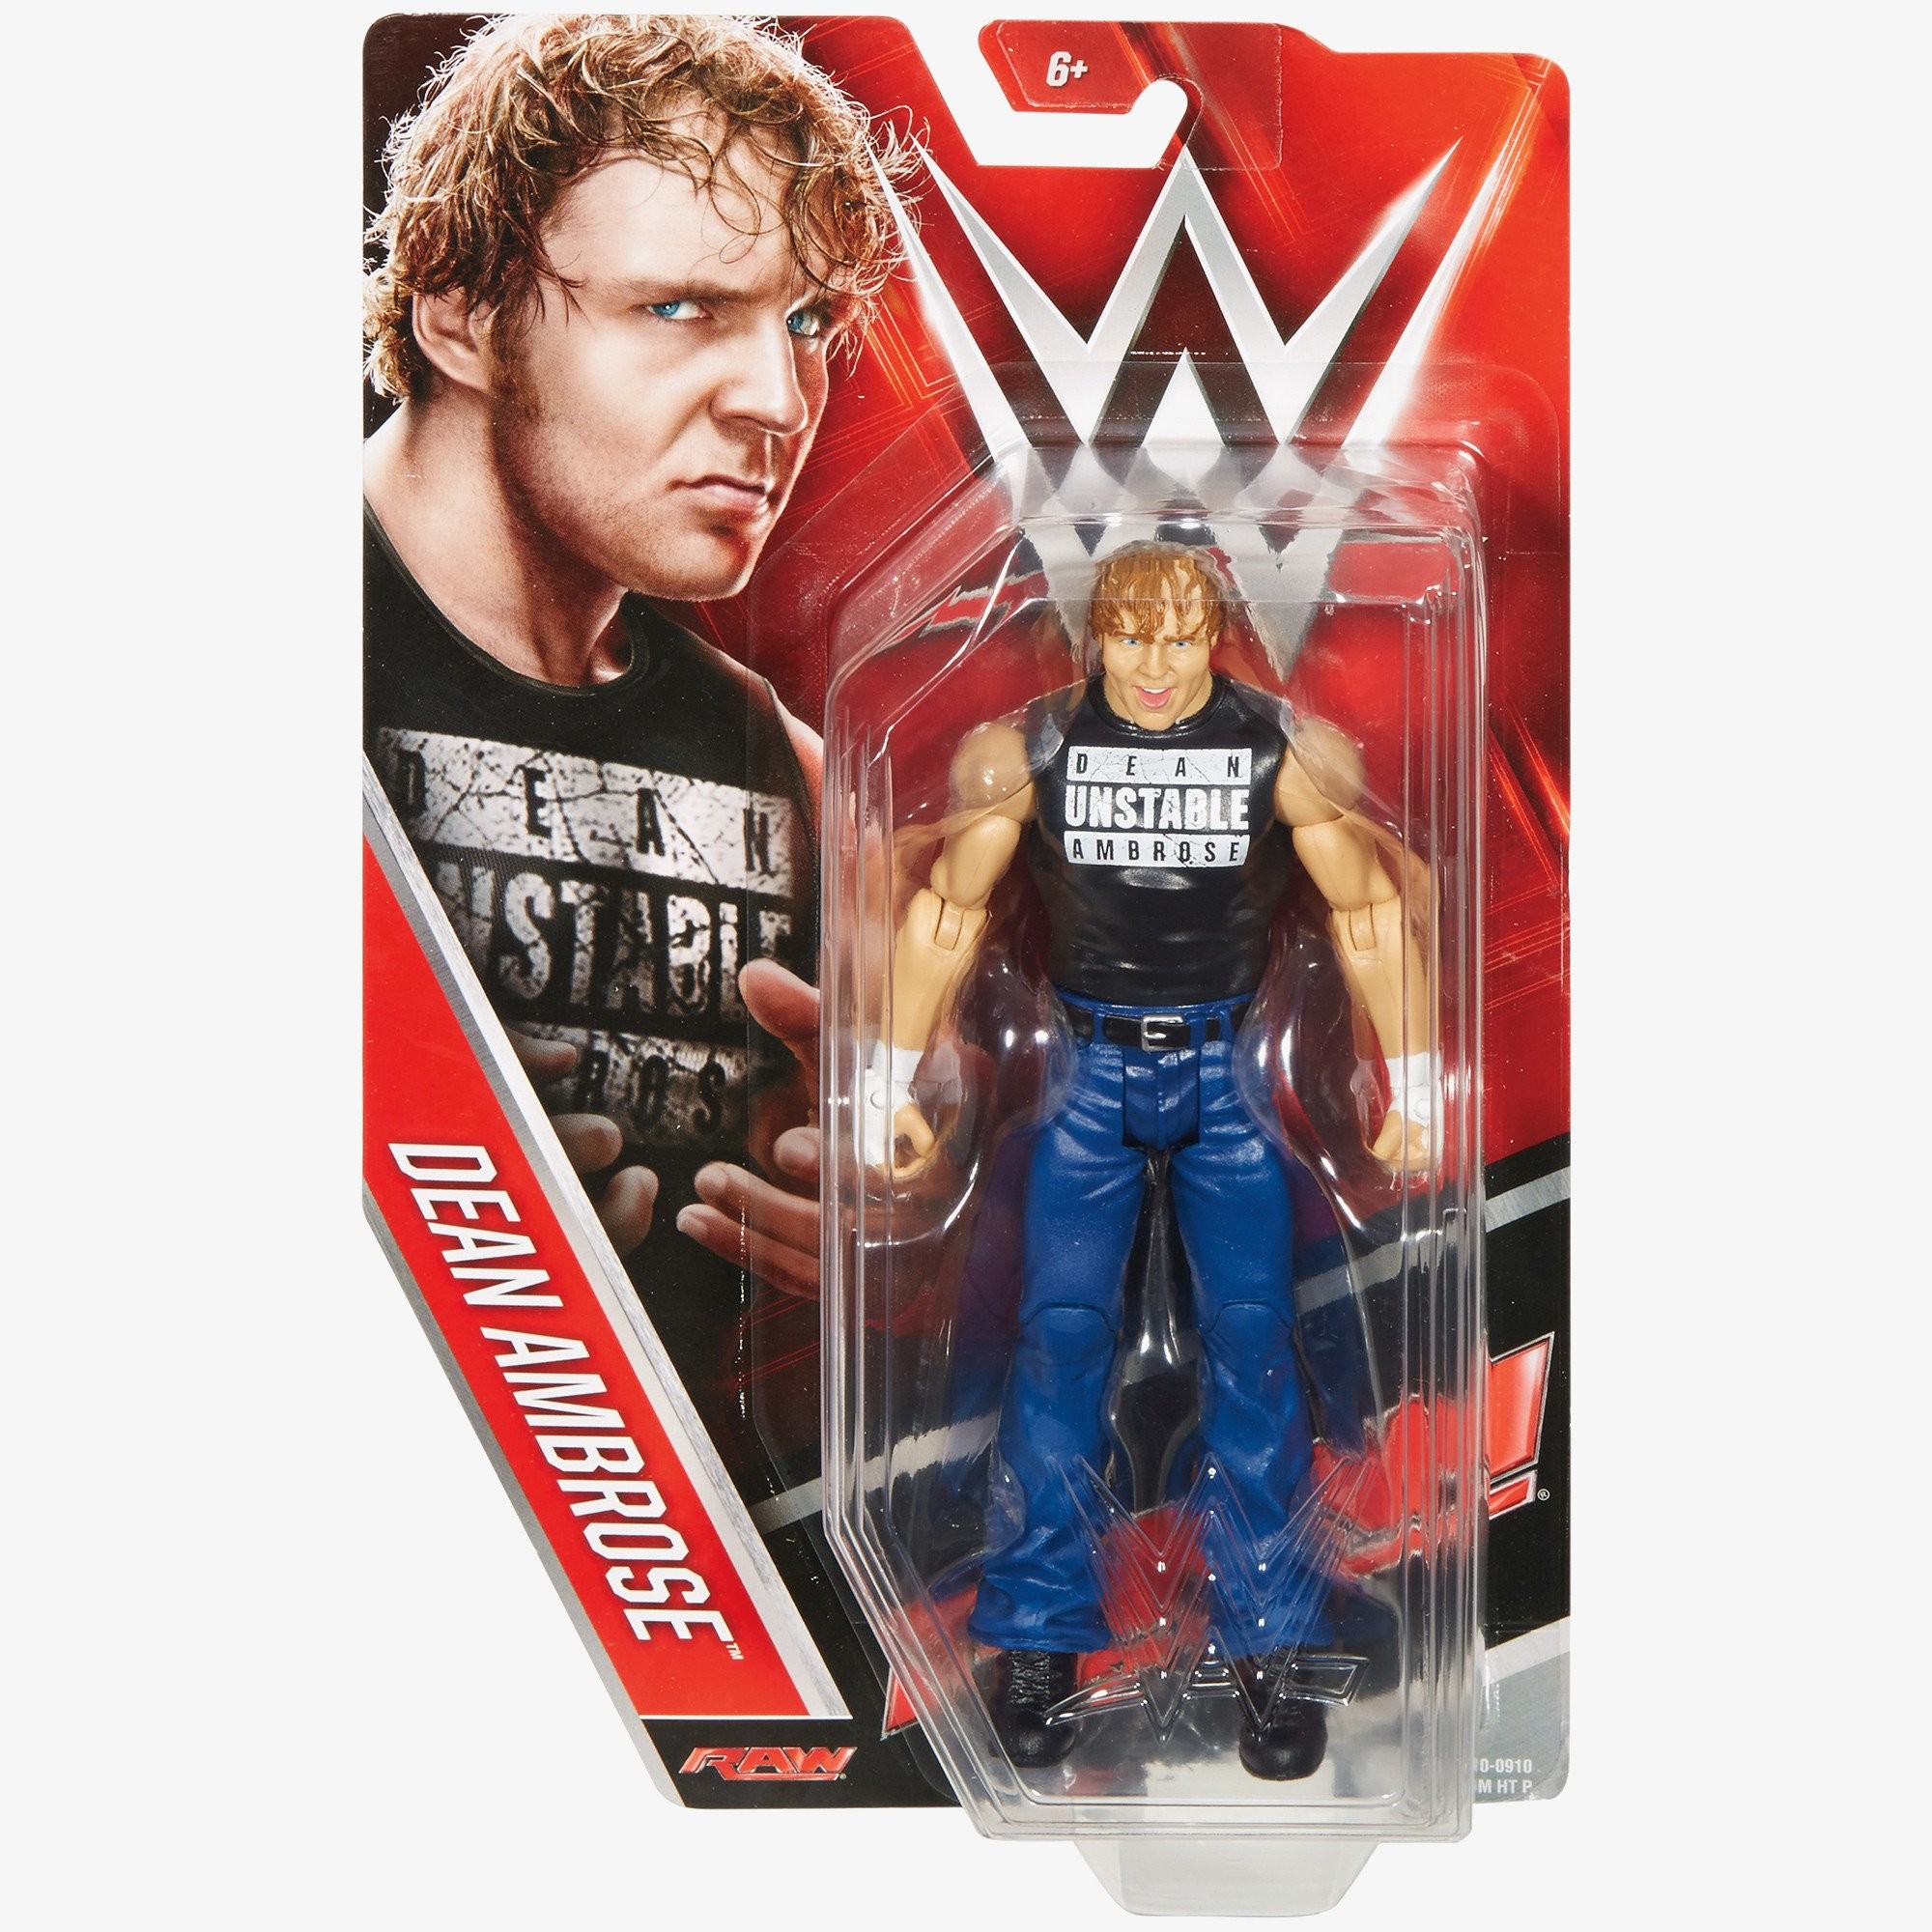 46 Best Aj Lee Images On Wrestling Divas And. Dean Ambrose The  Fromwrestlertoscreen